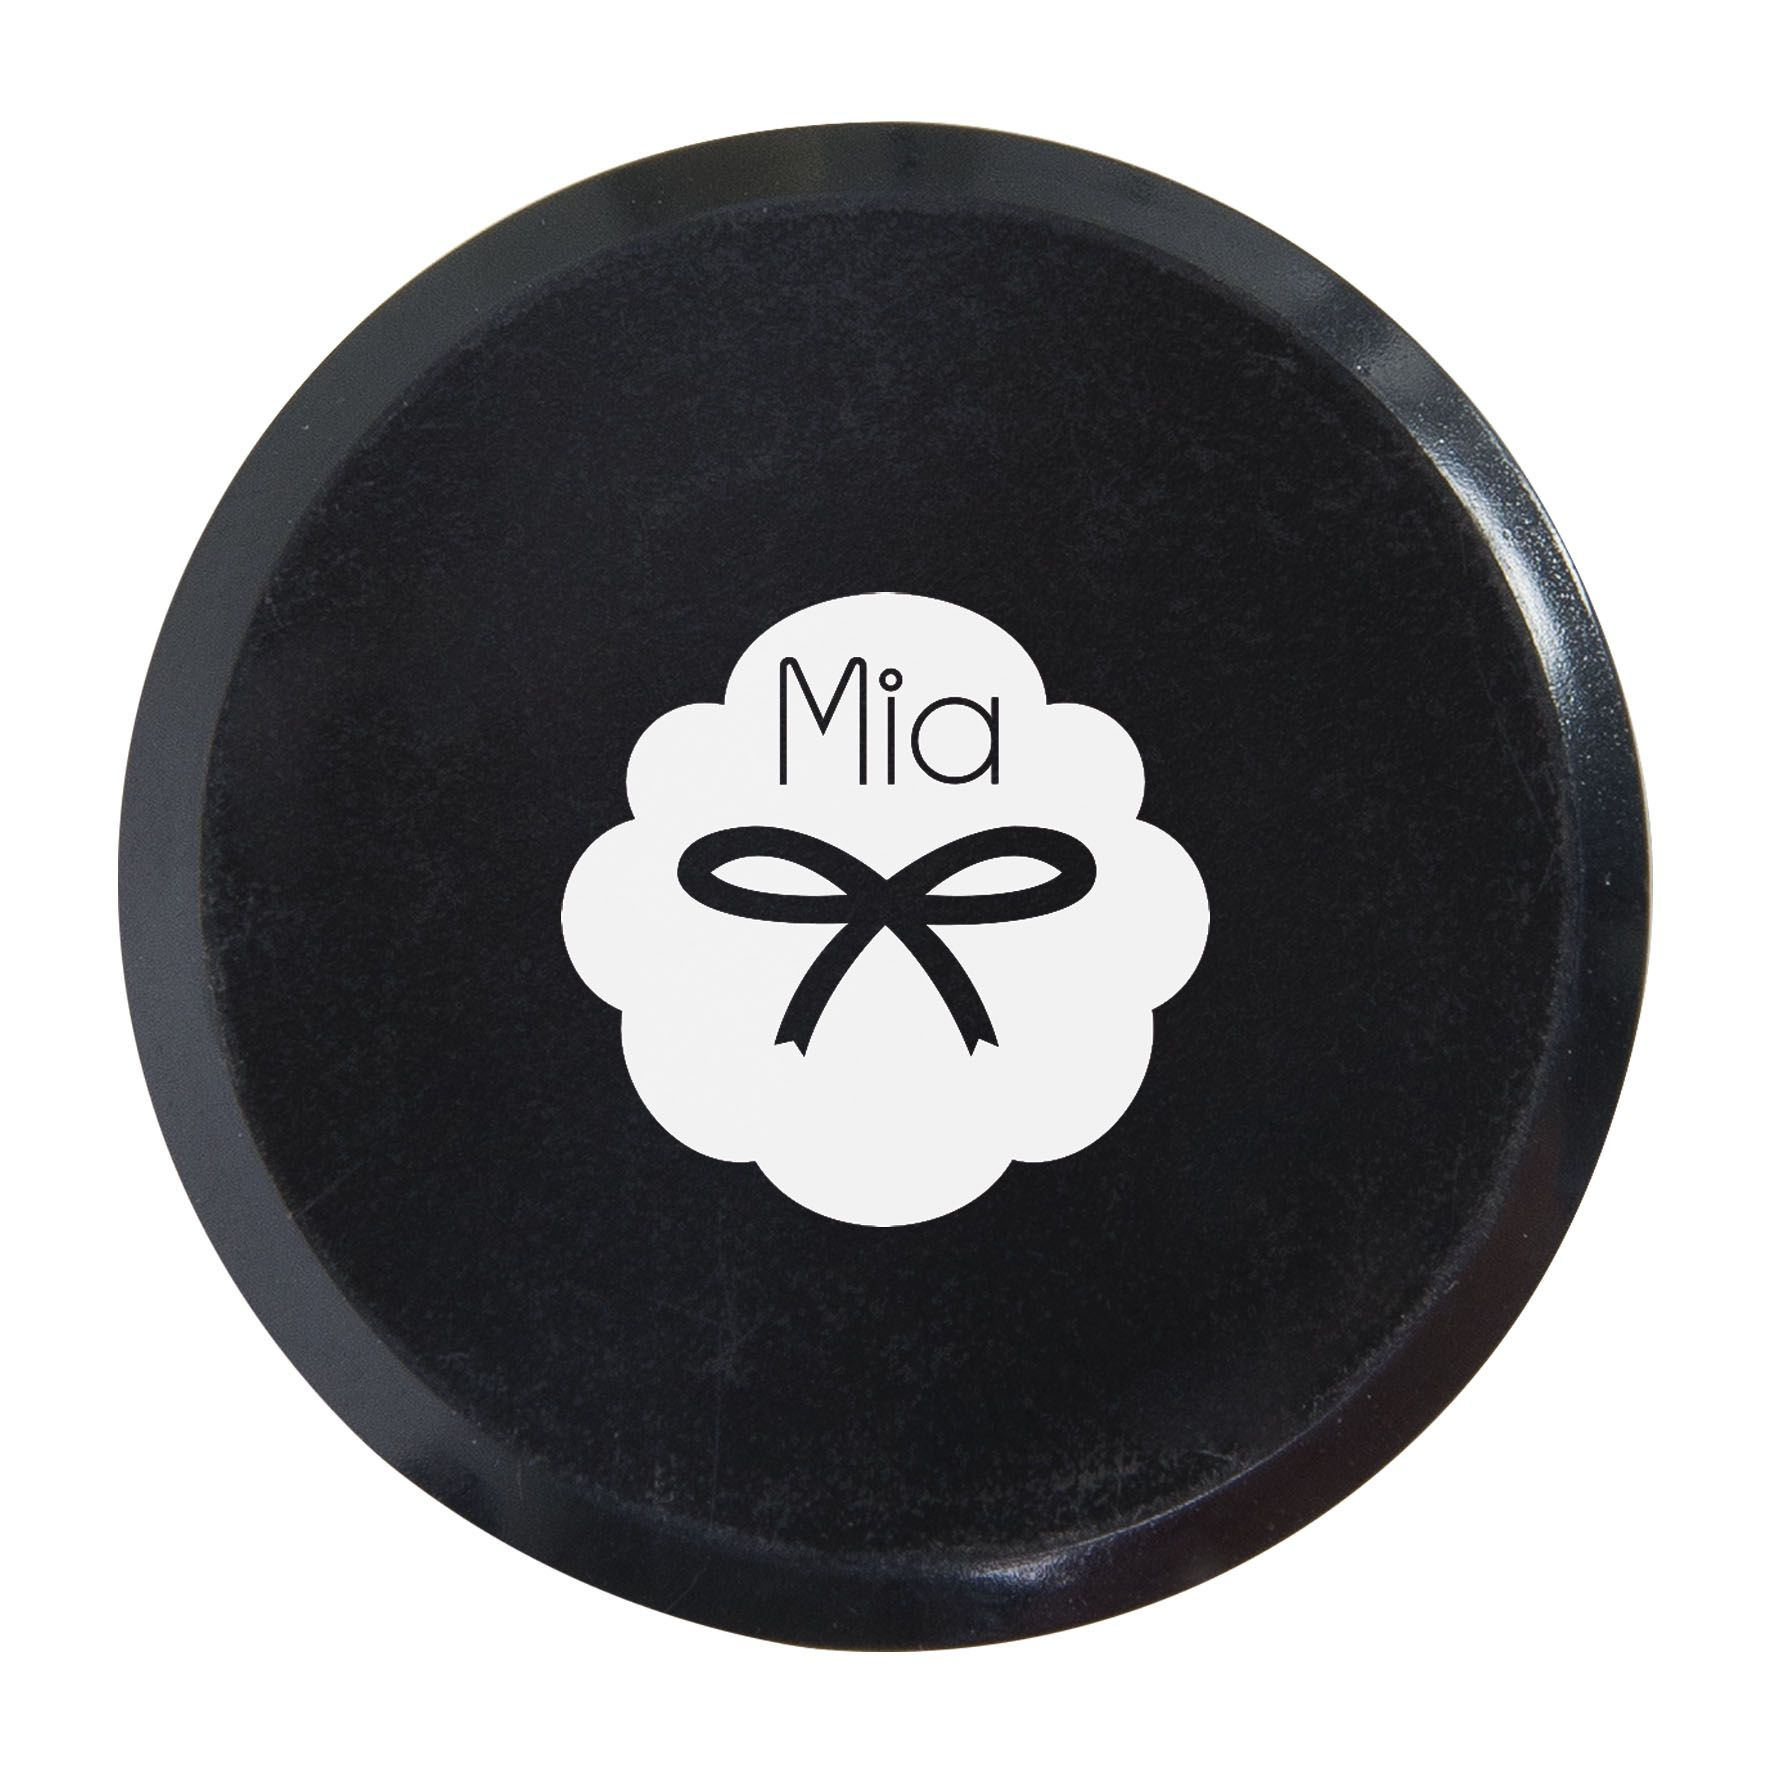 Goodies - Magnet personnalisable Ø 3cm - fond vert